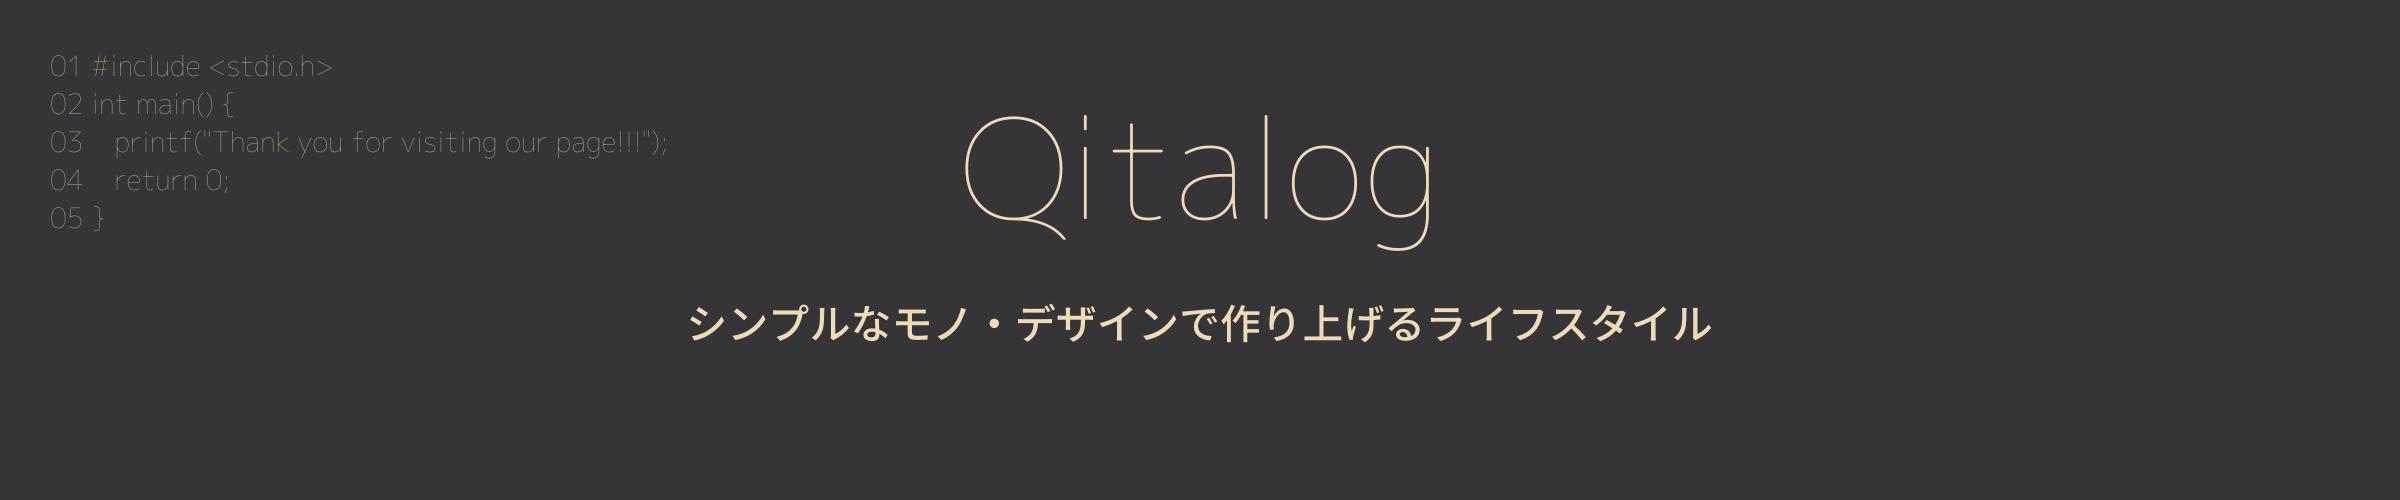 QITALOG